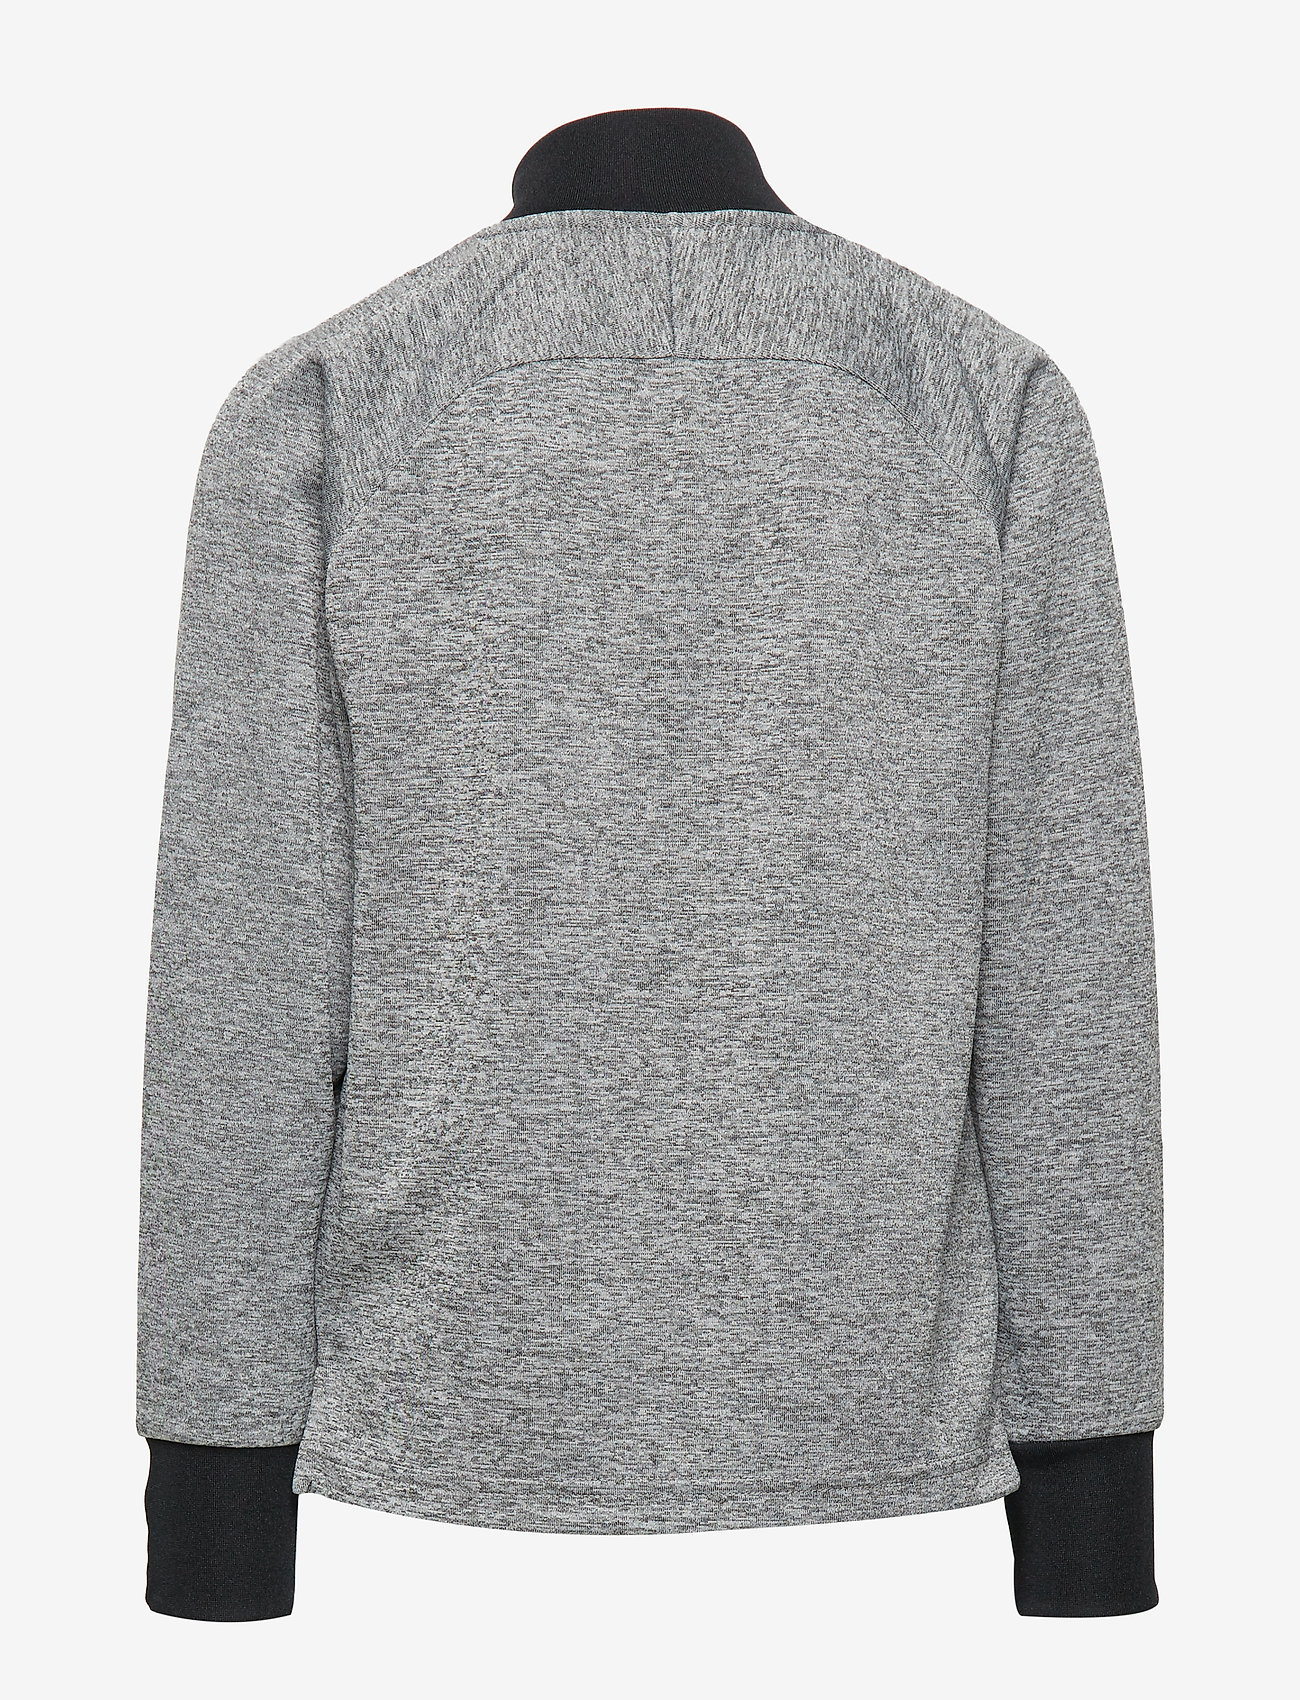 Hummel - hmlTHOR ZIP JACKET - sweats - medium melange